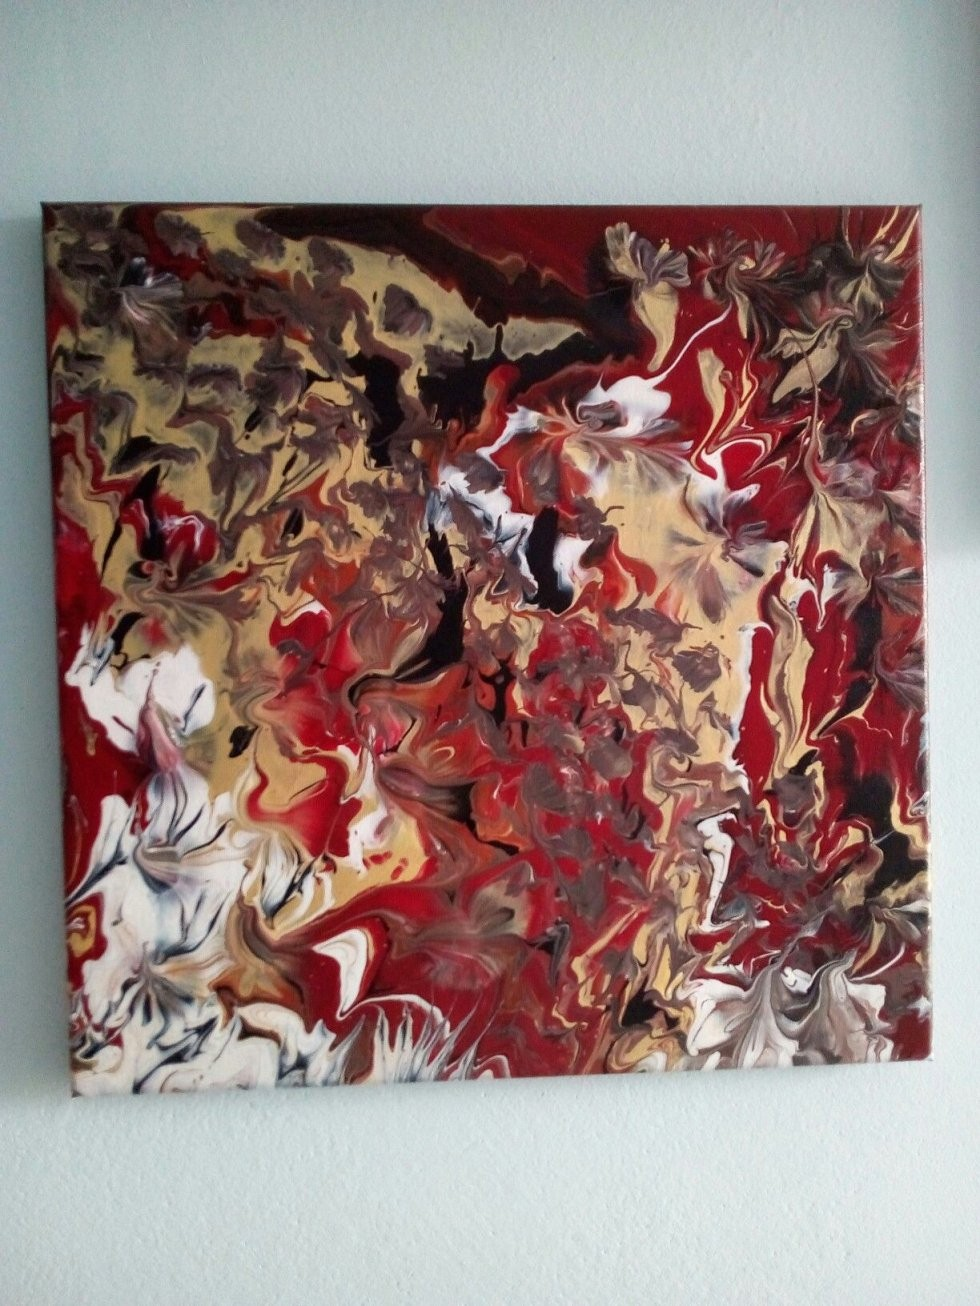 Bild Acrylfarbe Auf Leinwand Abstrakt Keilrahmen 40X40 Schwarz Rot von Bilder Leinwand Abstrakt Keilrahmen Bild